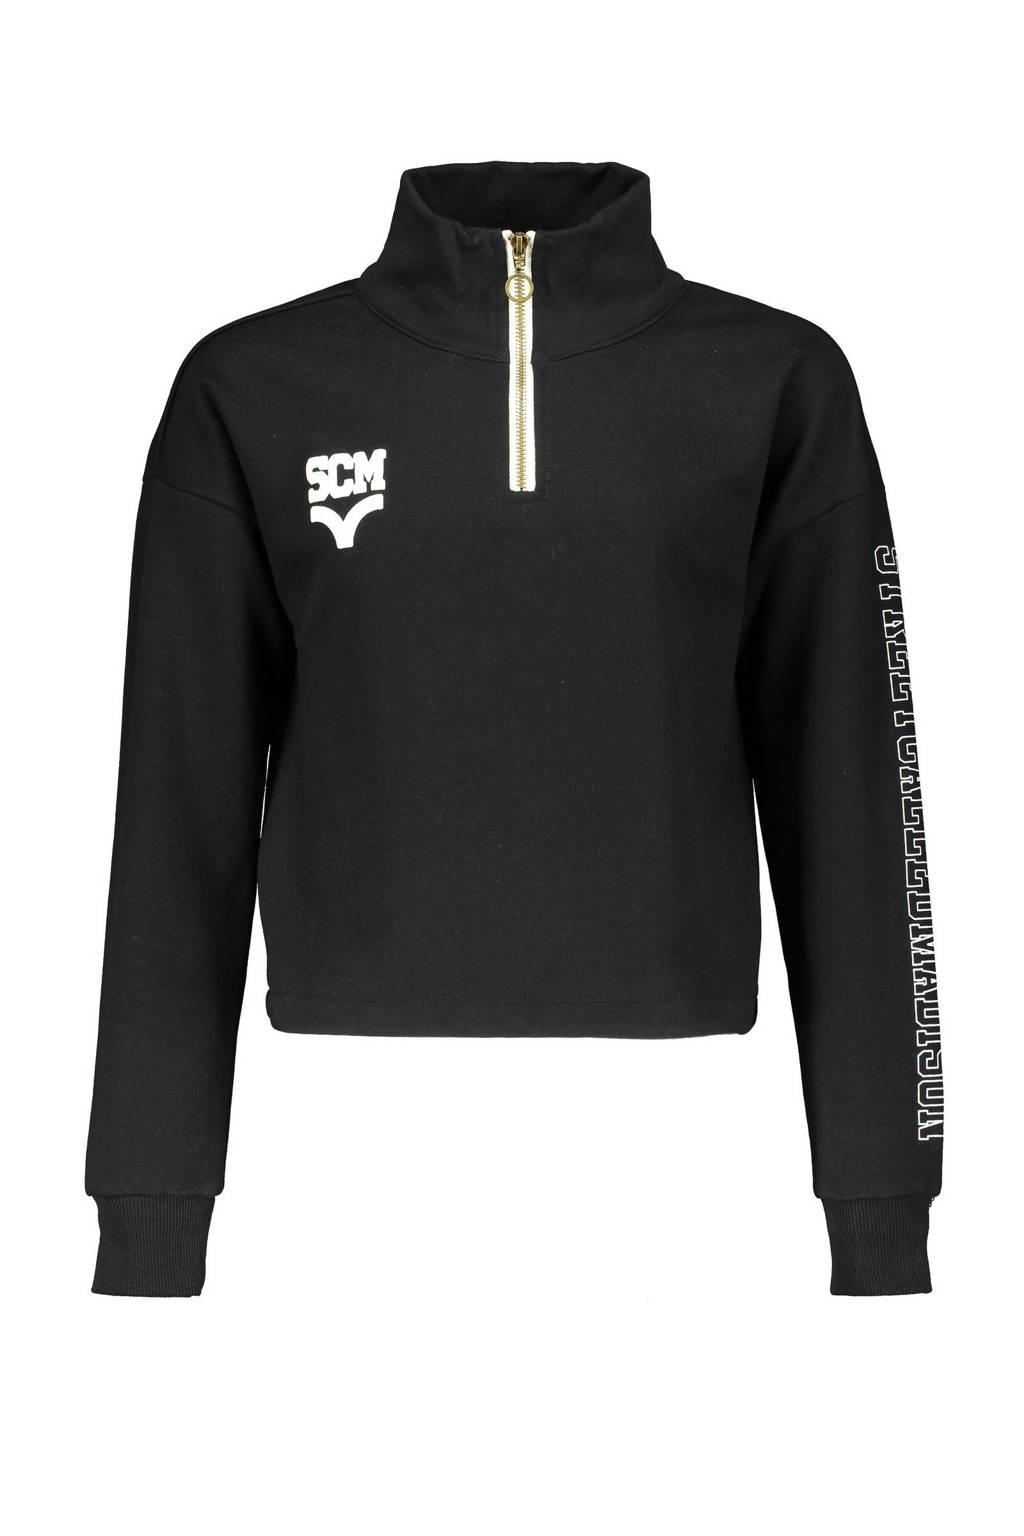 Street called Madison sweater Daily zwart, Zwart